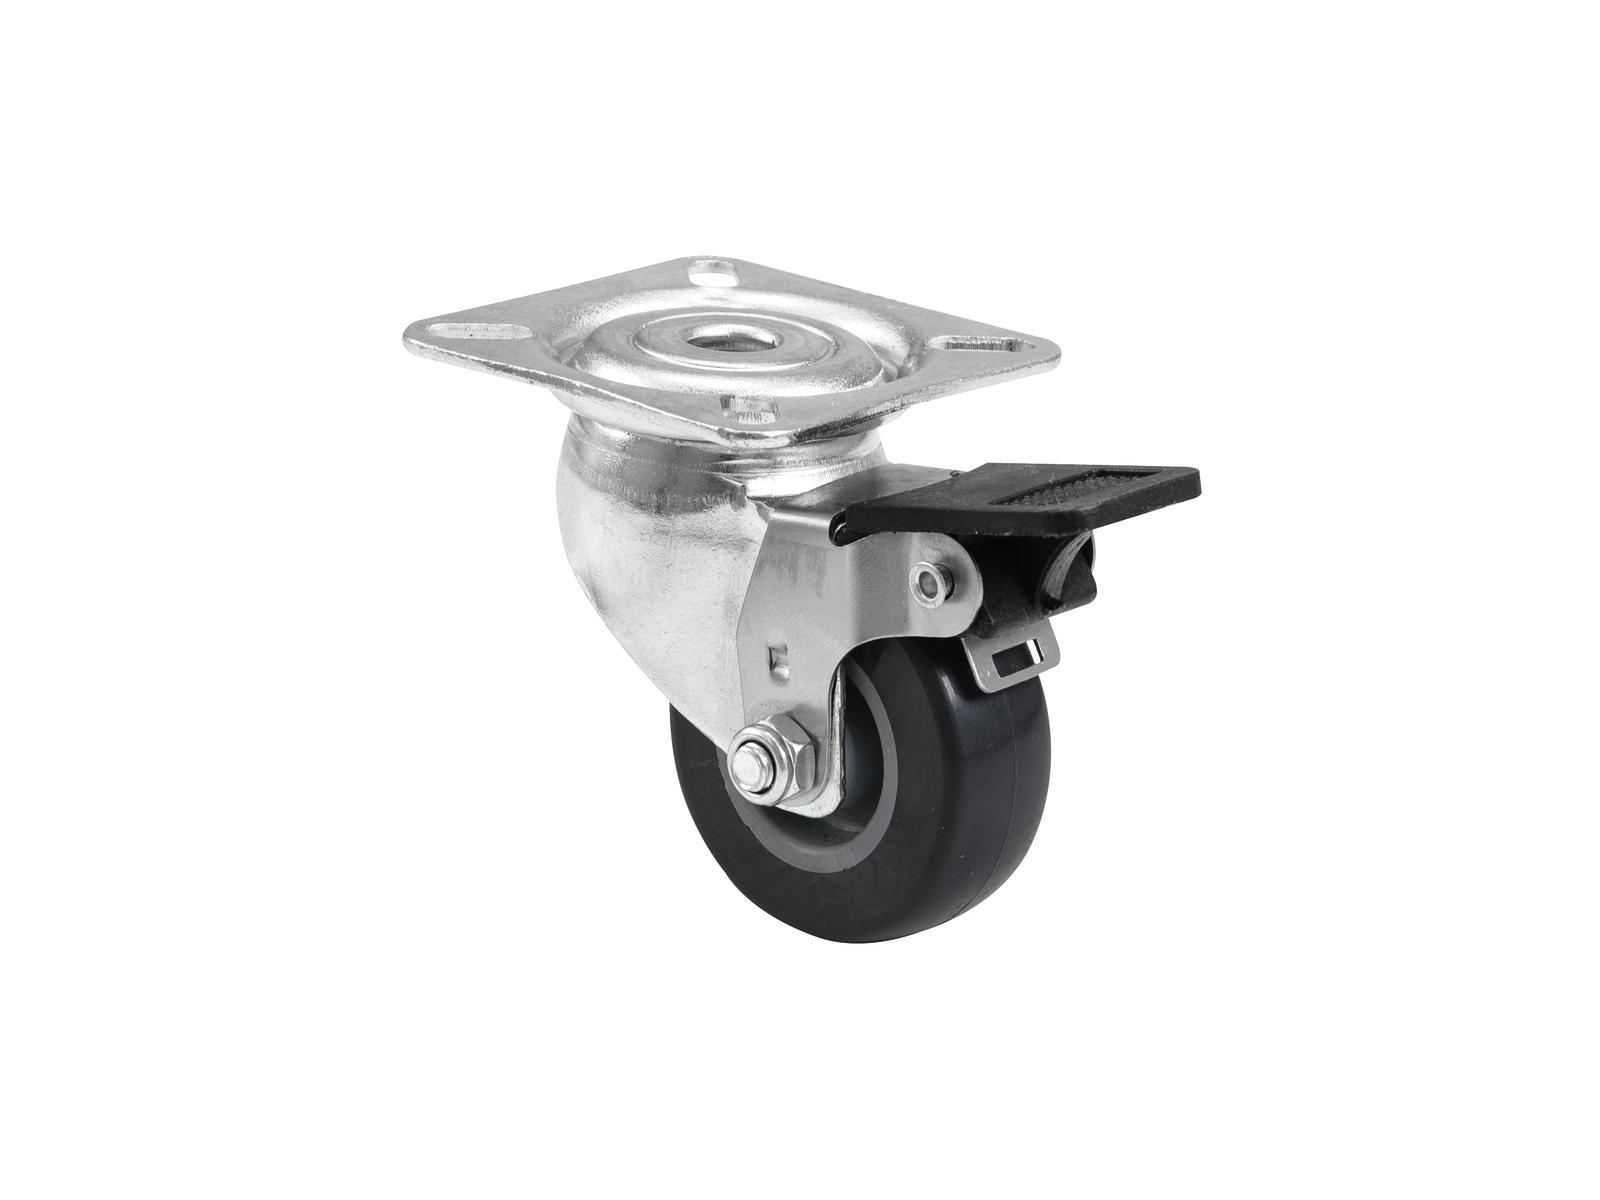 ROADINGER Lenkrolle 50mm grau mit Bremse